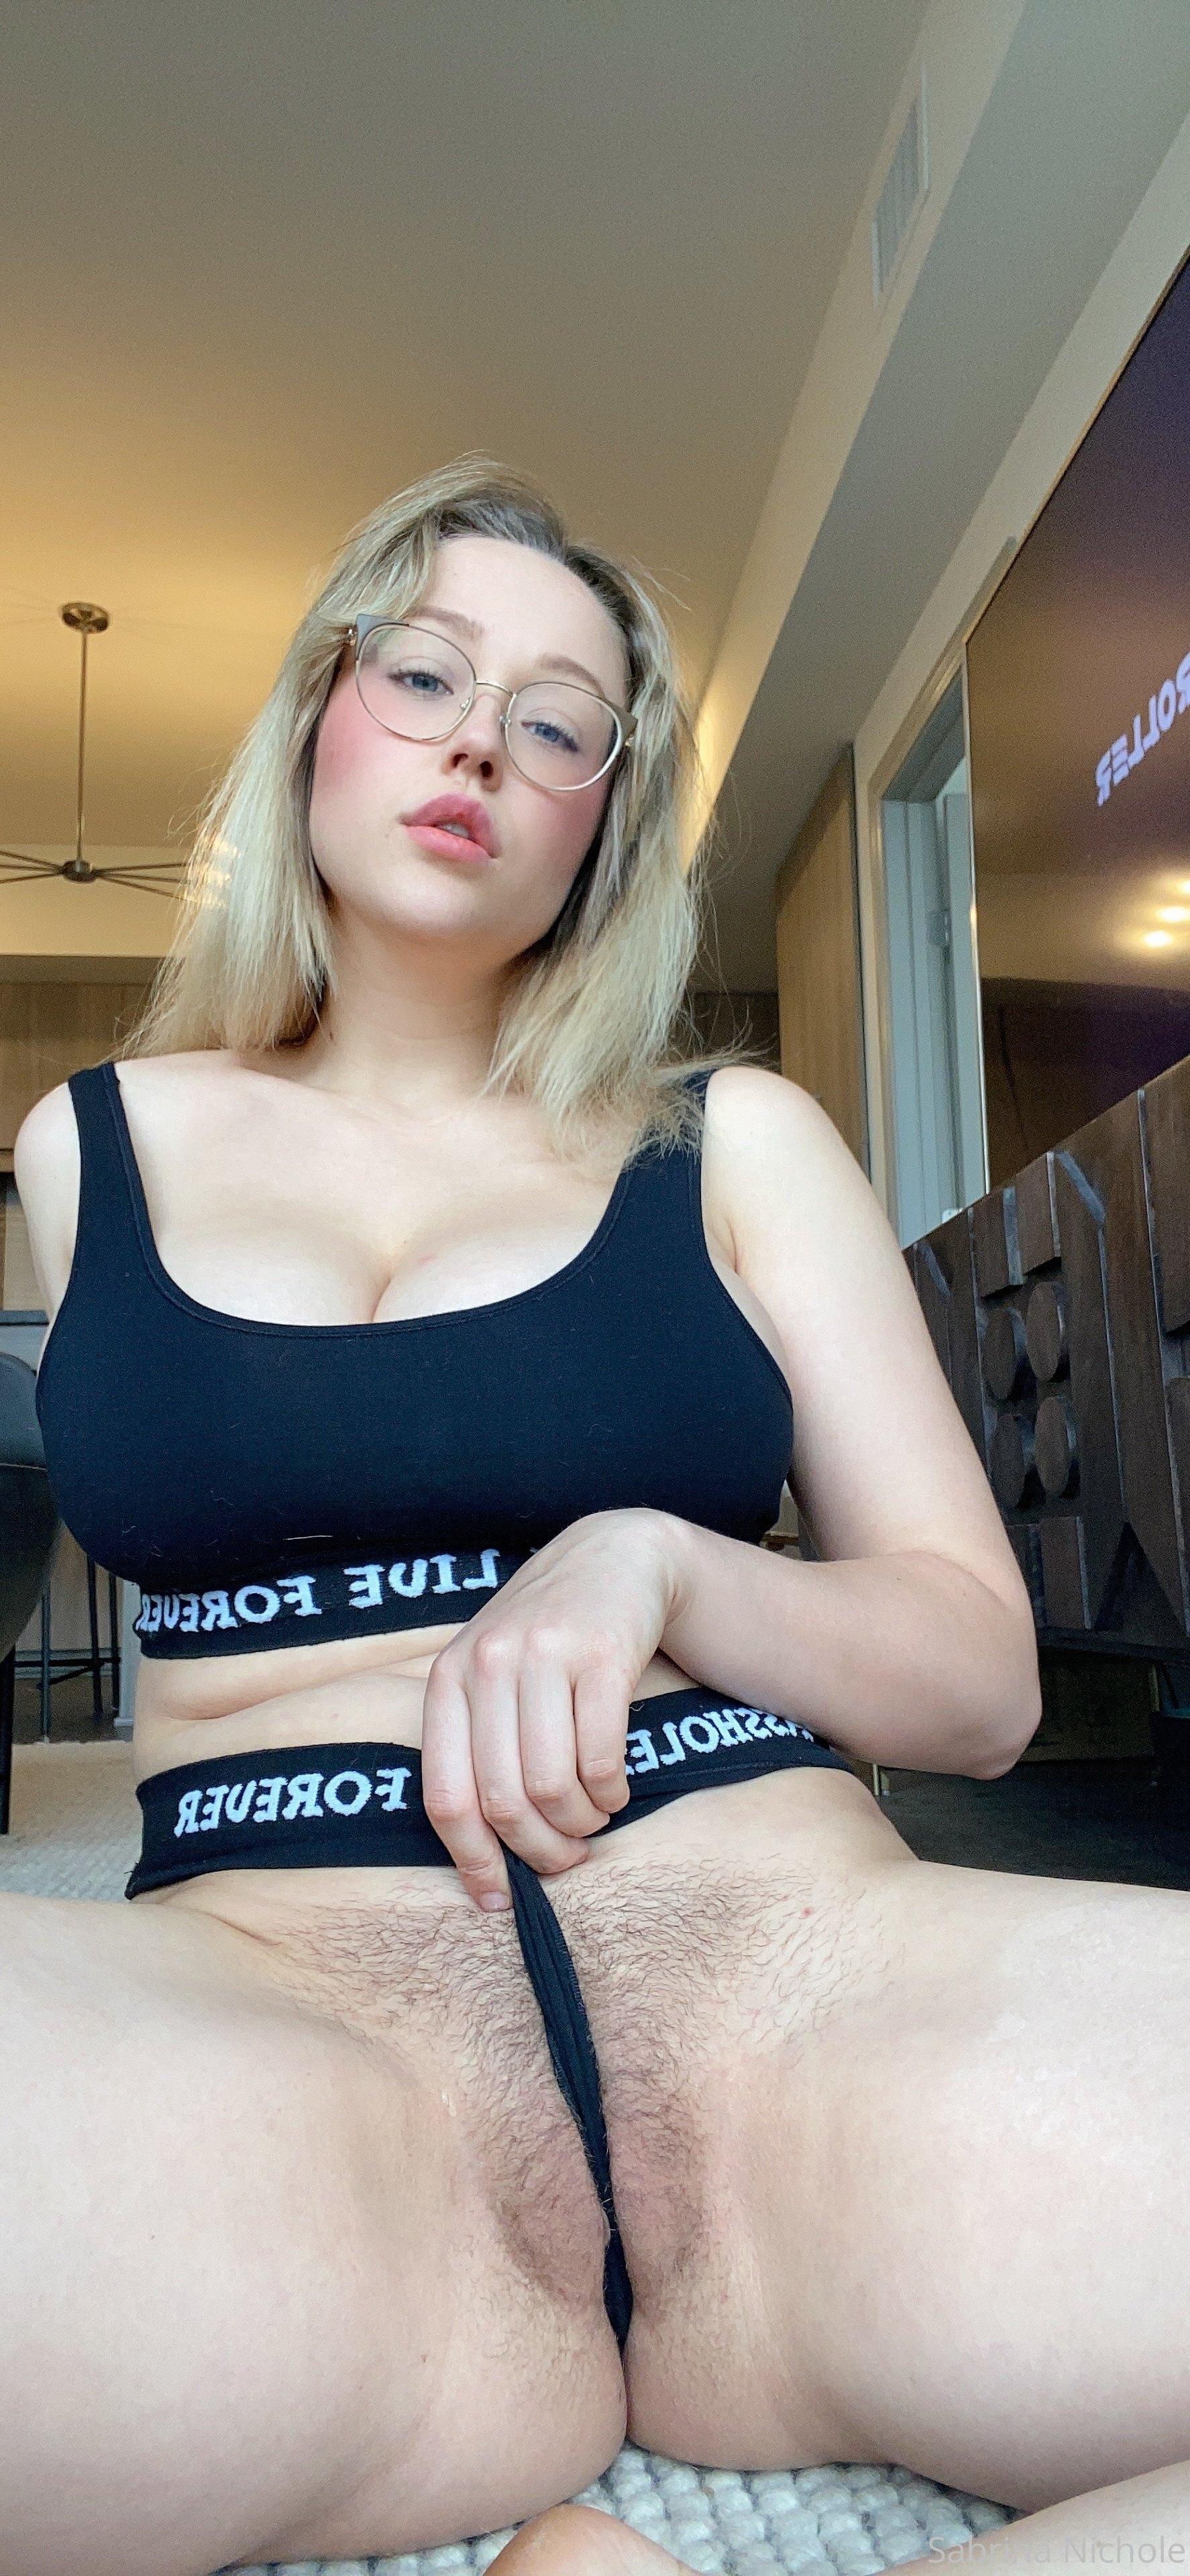 Sabrina Nichole 0129